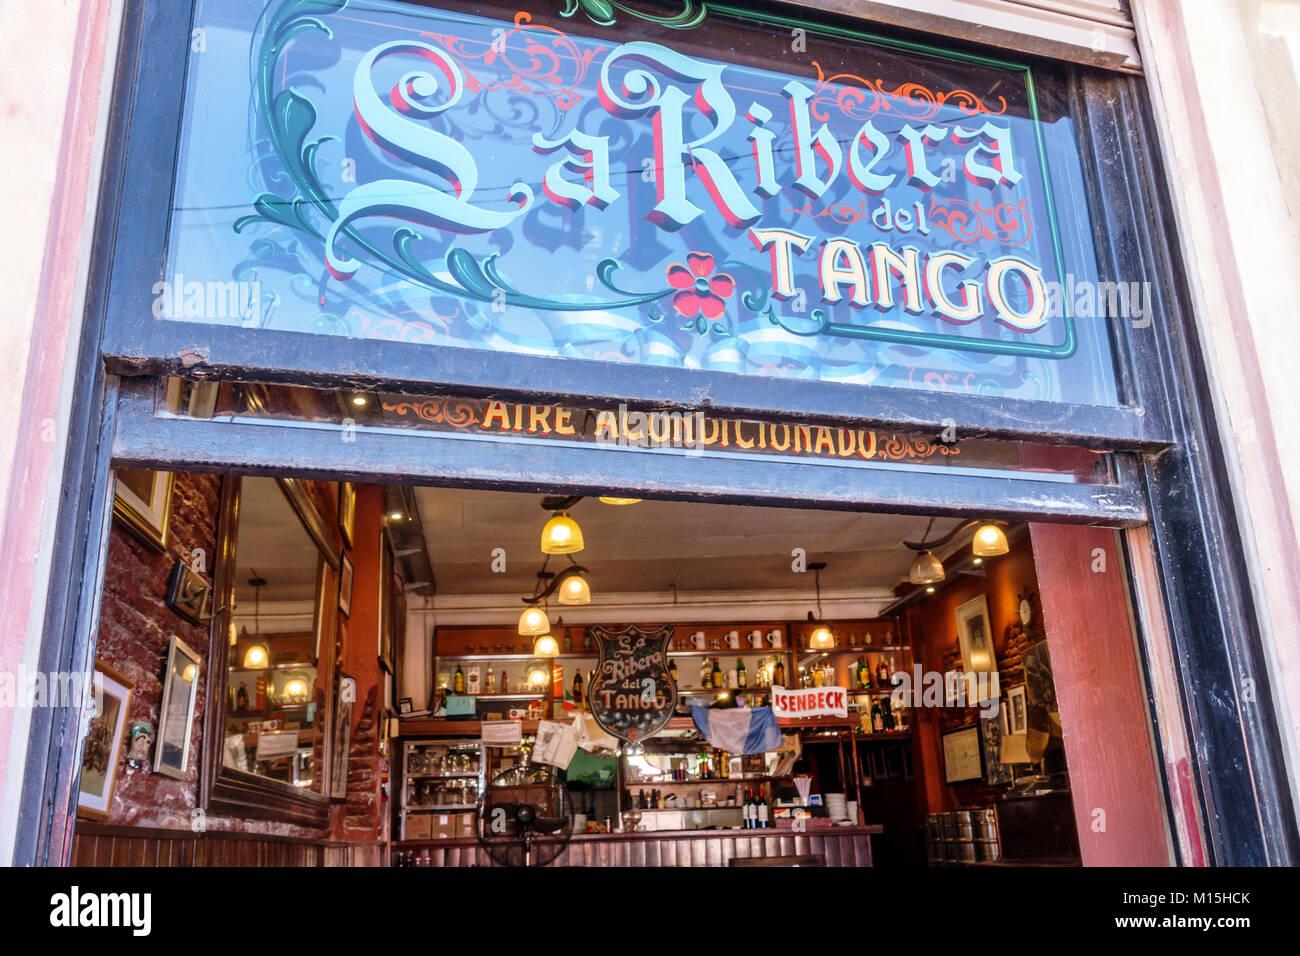 Buenos Aires Argentina Caminito Barrio de la Boca La Ribera Del Tango restaurant bar entrance sign Hispanic Argentinean - Stock Image